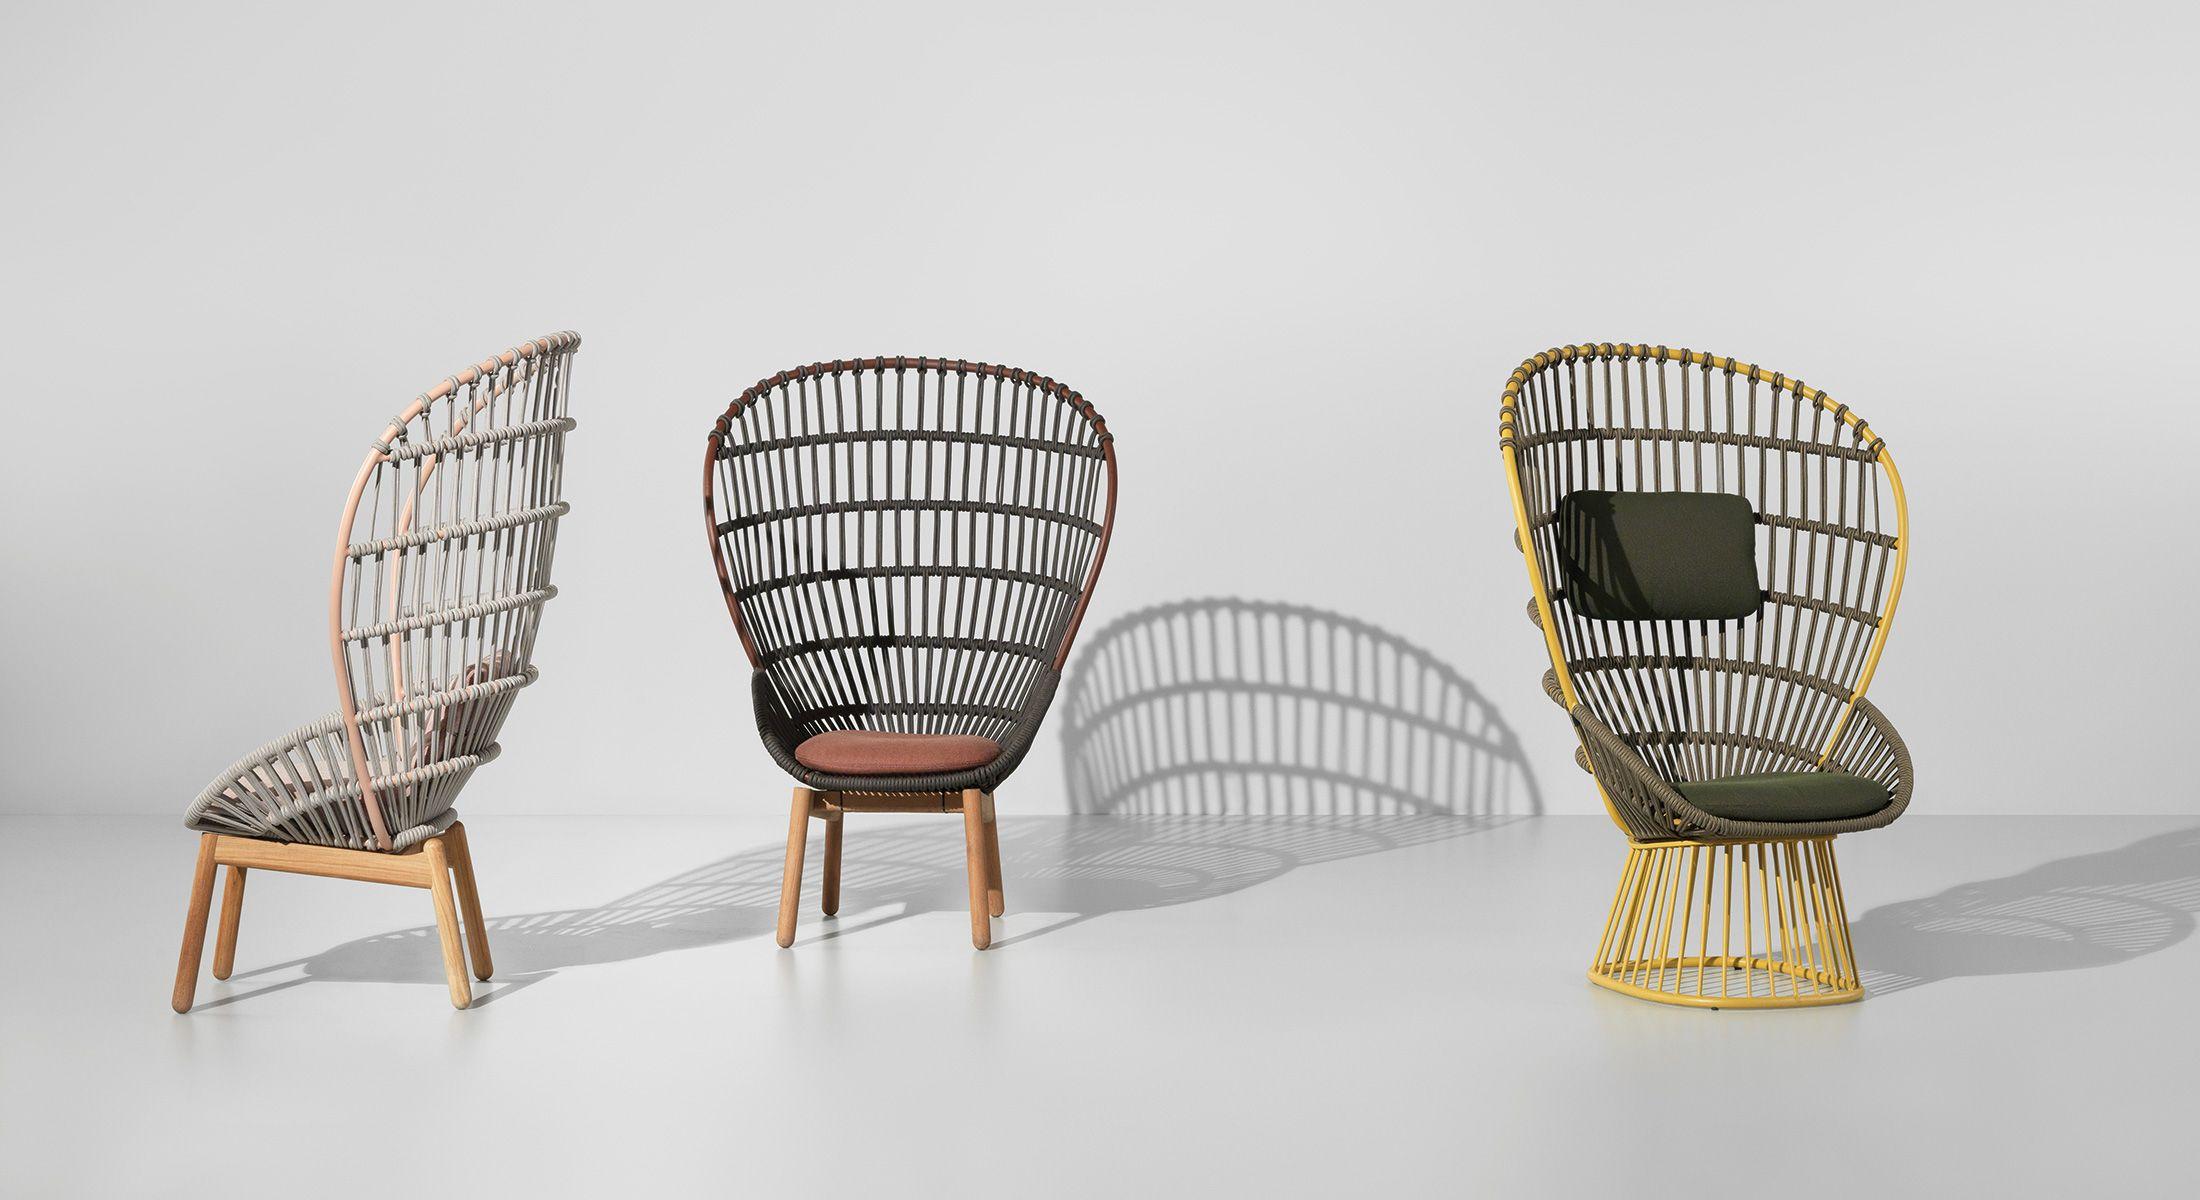 Kettal Muebles De Diseno De Exterior Chair Sofa Stool - Kettal-muebles